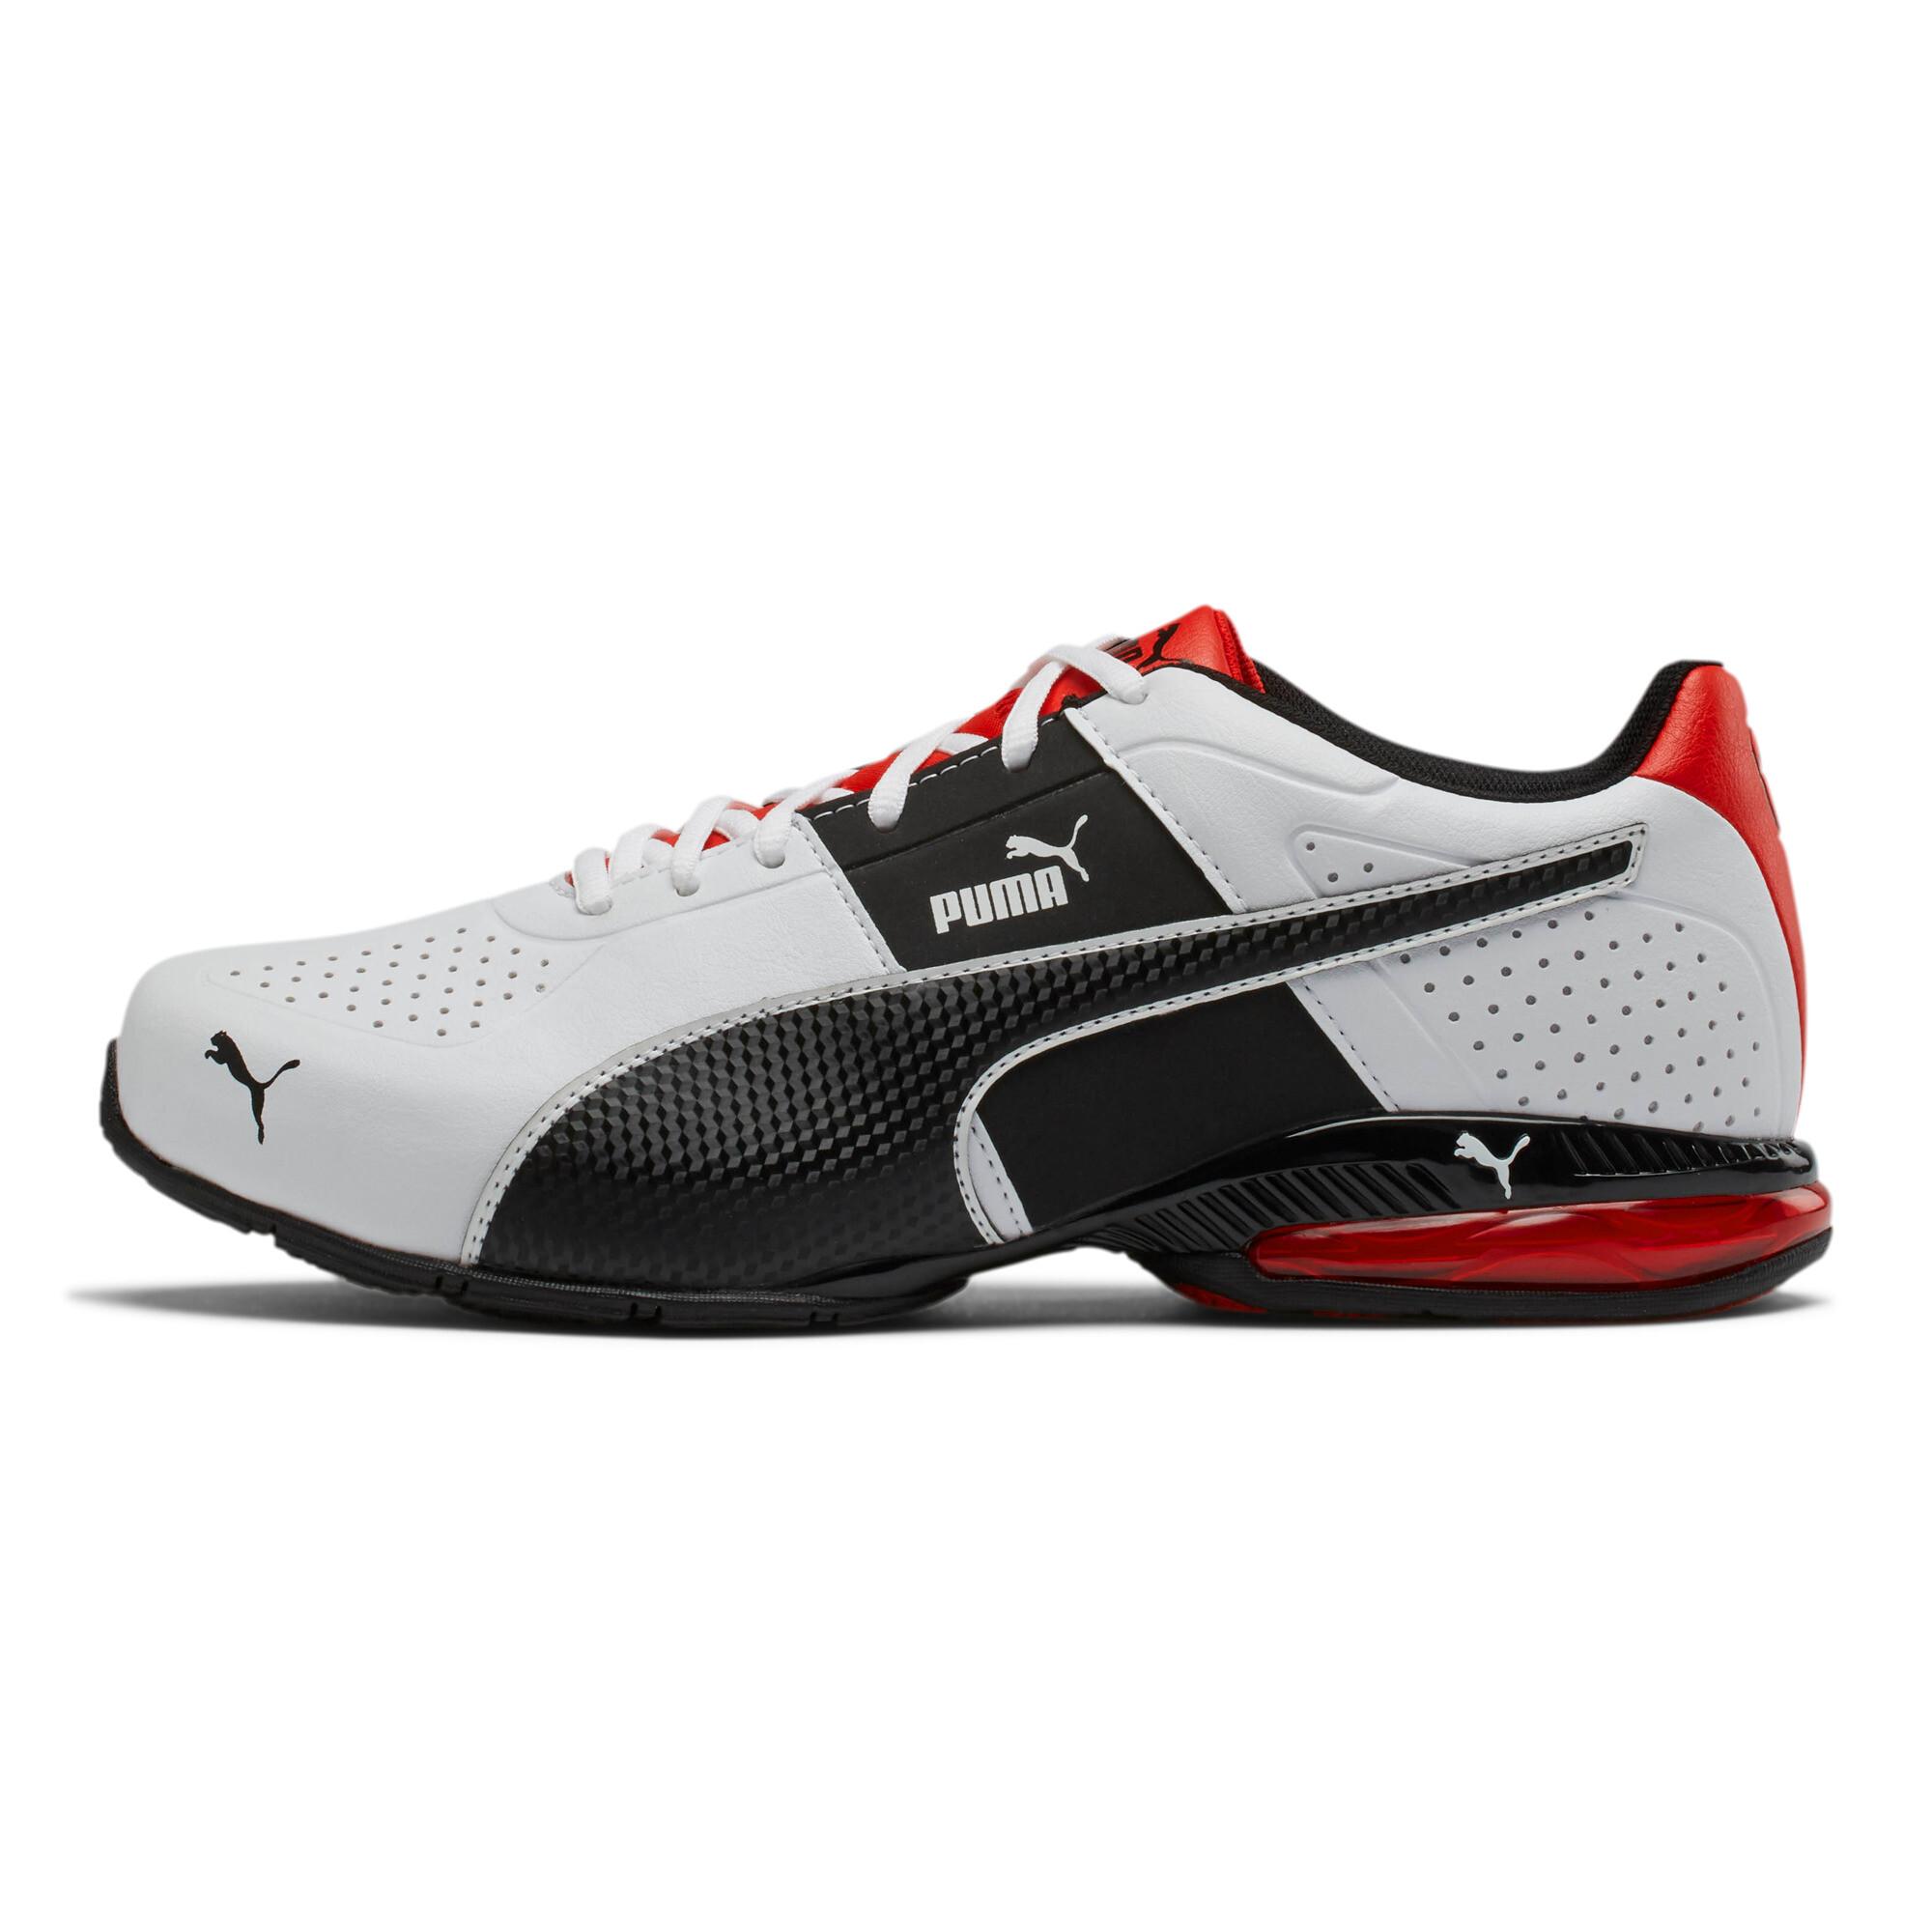 PUMA-Cell-Surin-2-Wide-Men-s-Training-Shoes-Men-Shoe-Running thumbnail 4